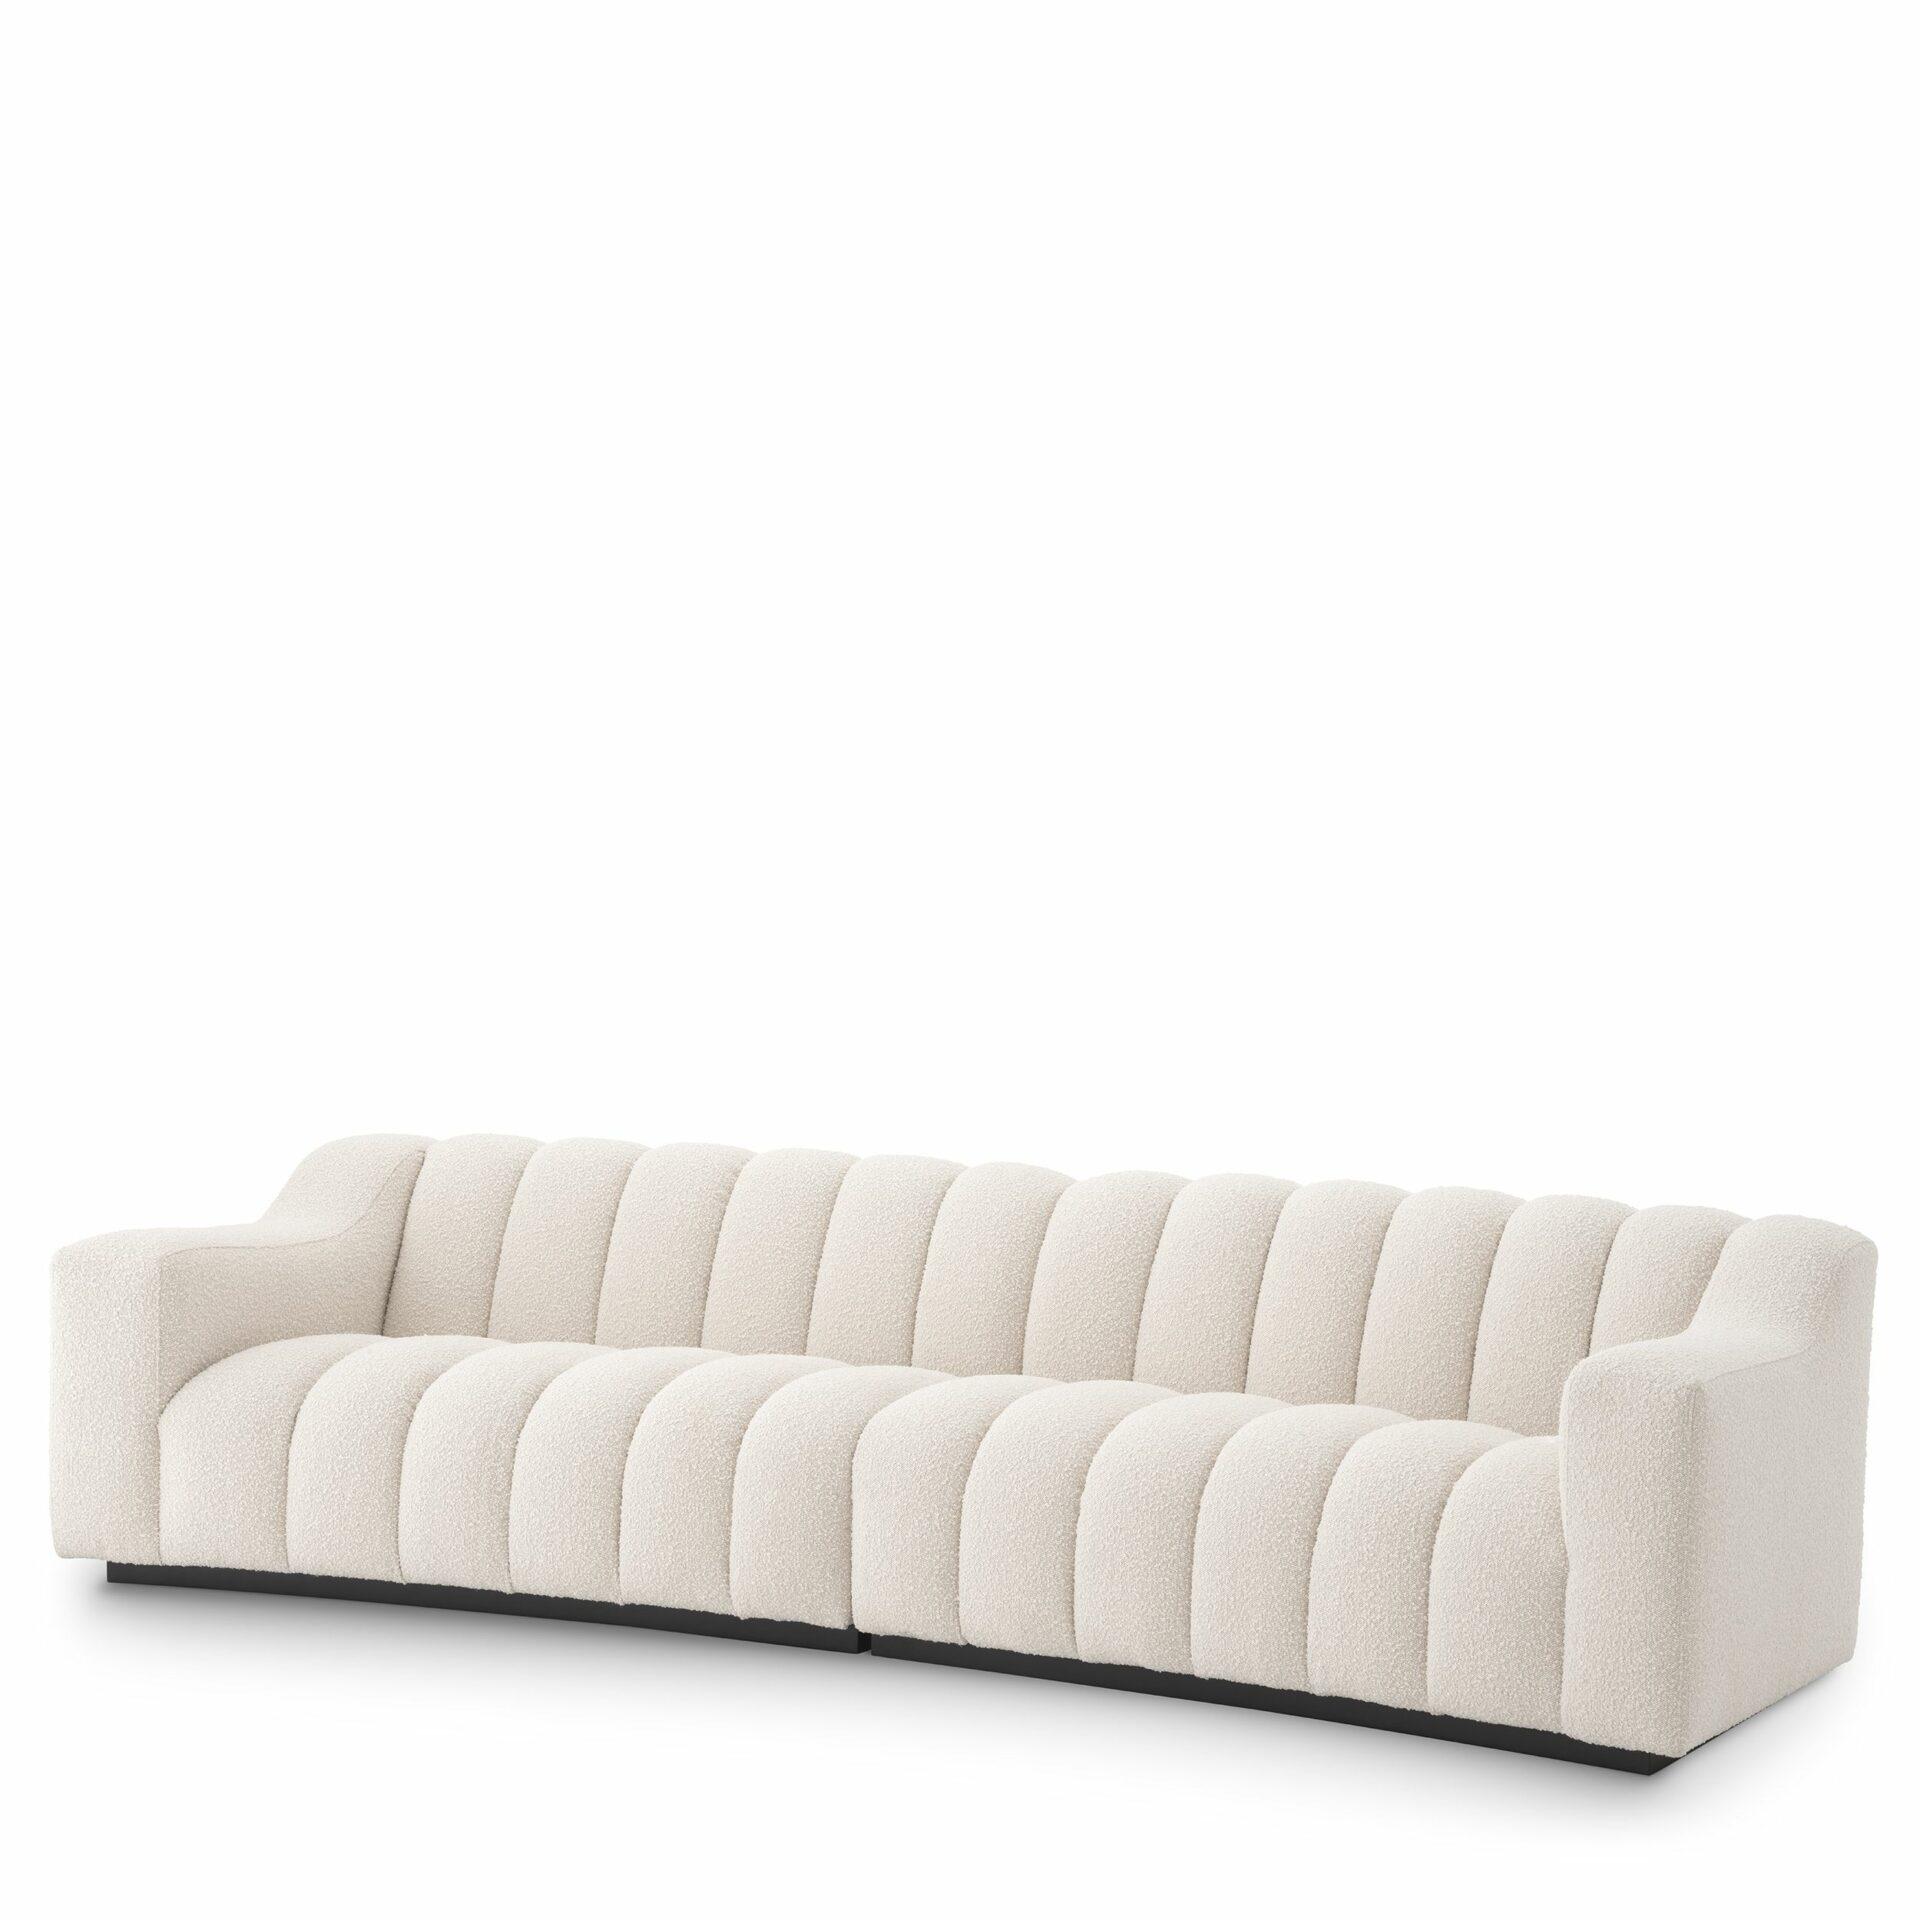 eichholtz-sofa-kelly-l